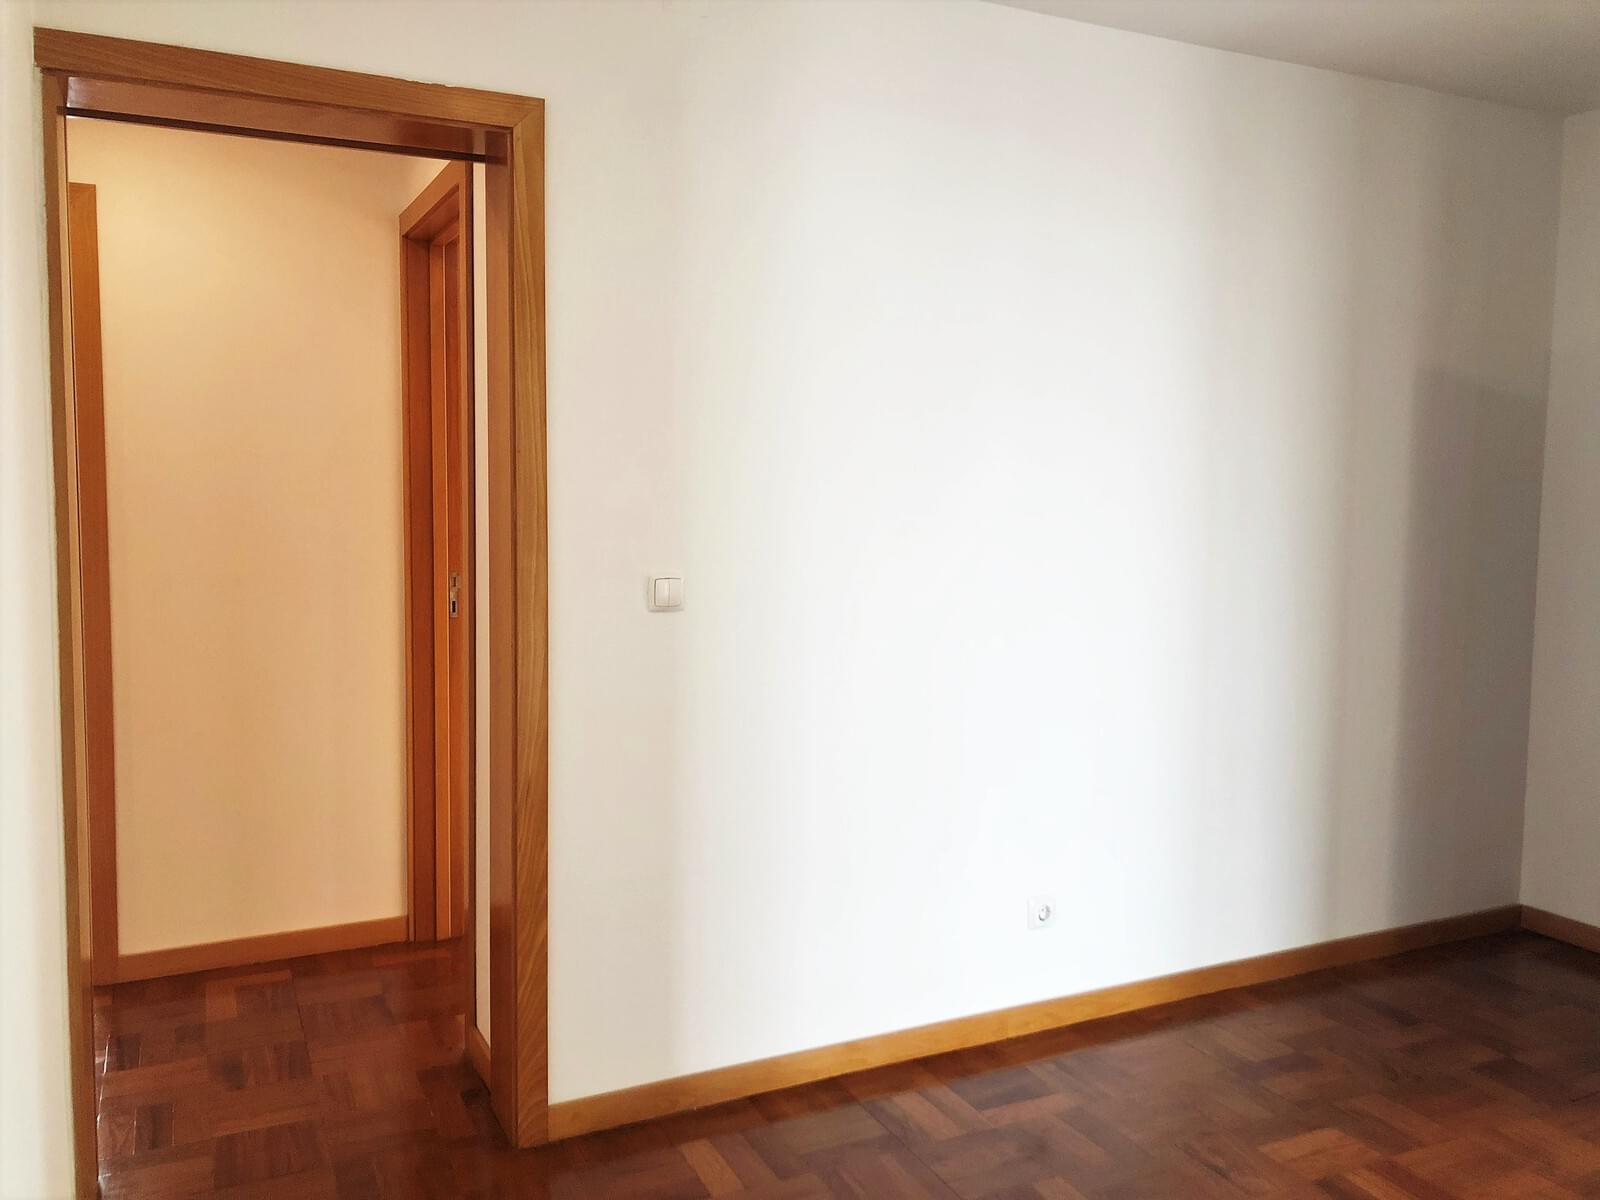 pf18040-apartamento-t3-lisboa-b0c2a589-34d7-4f93-9cb8-2b56c51f054f